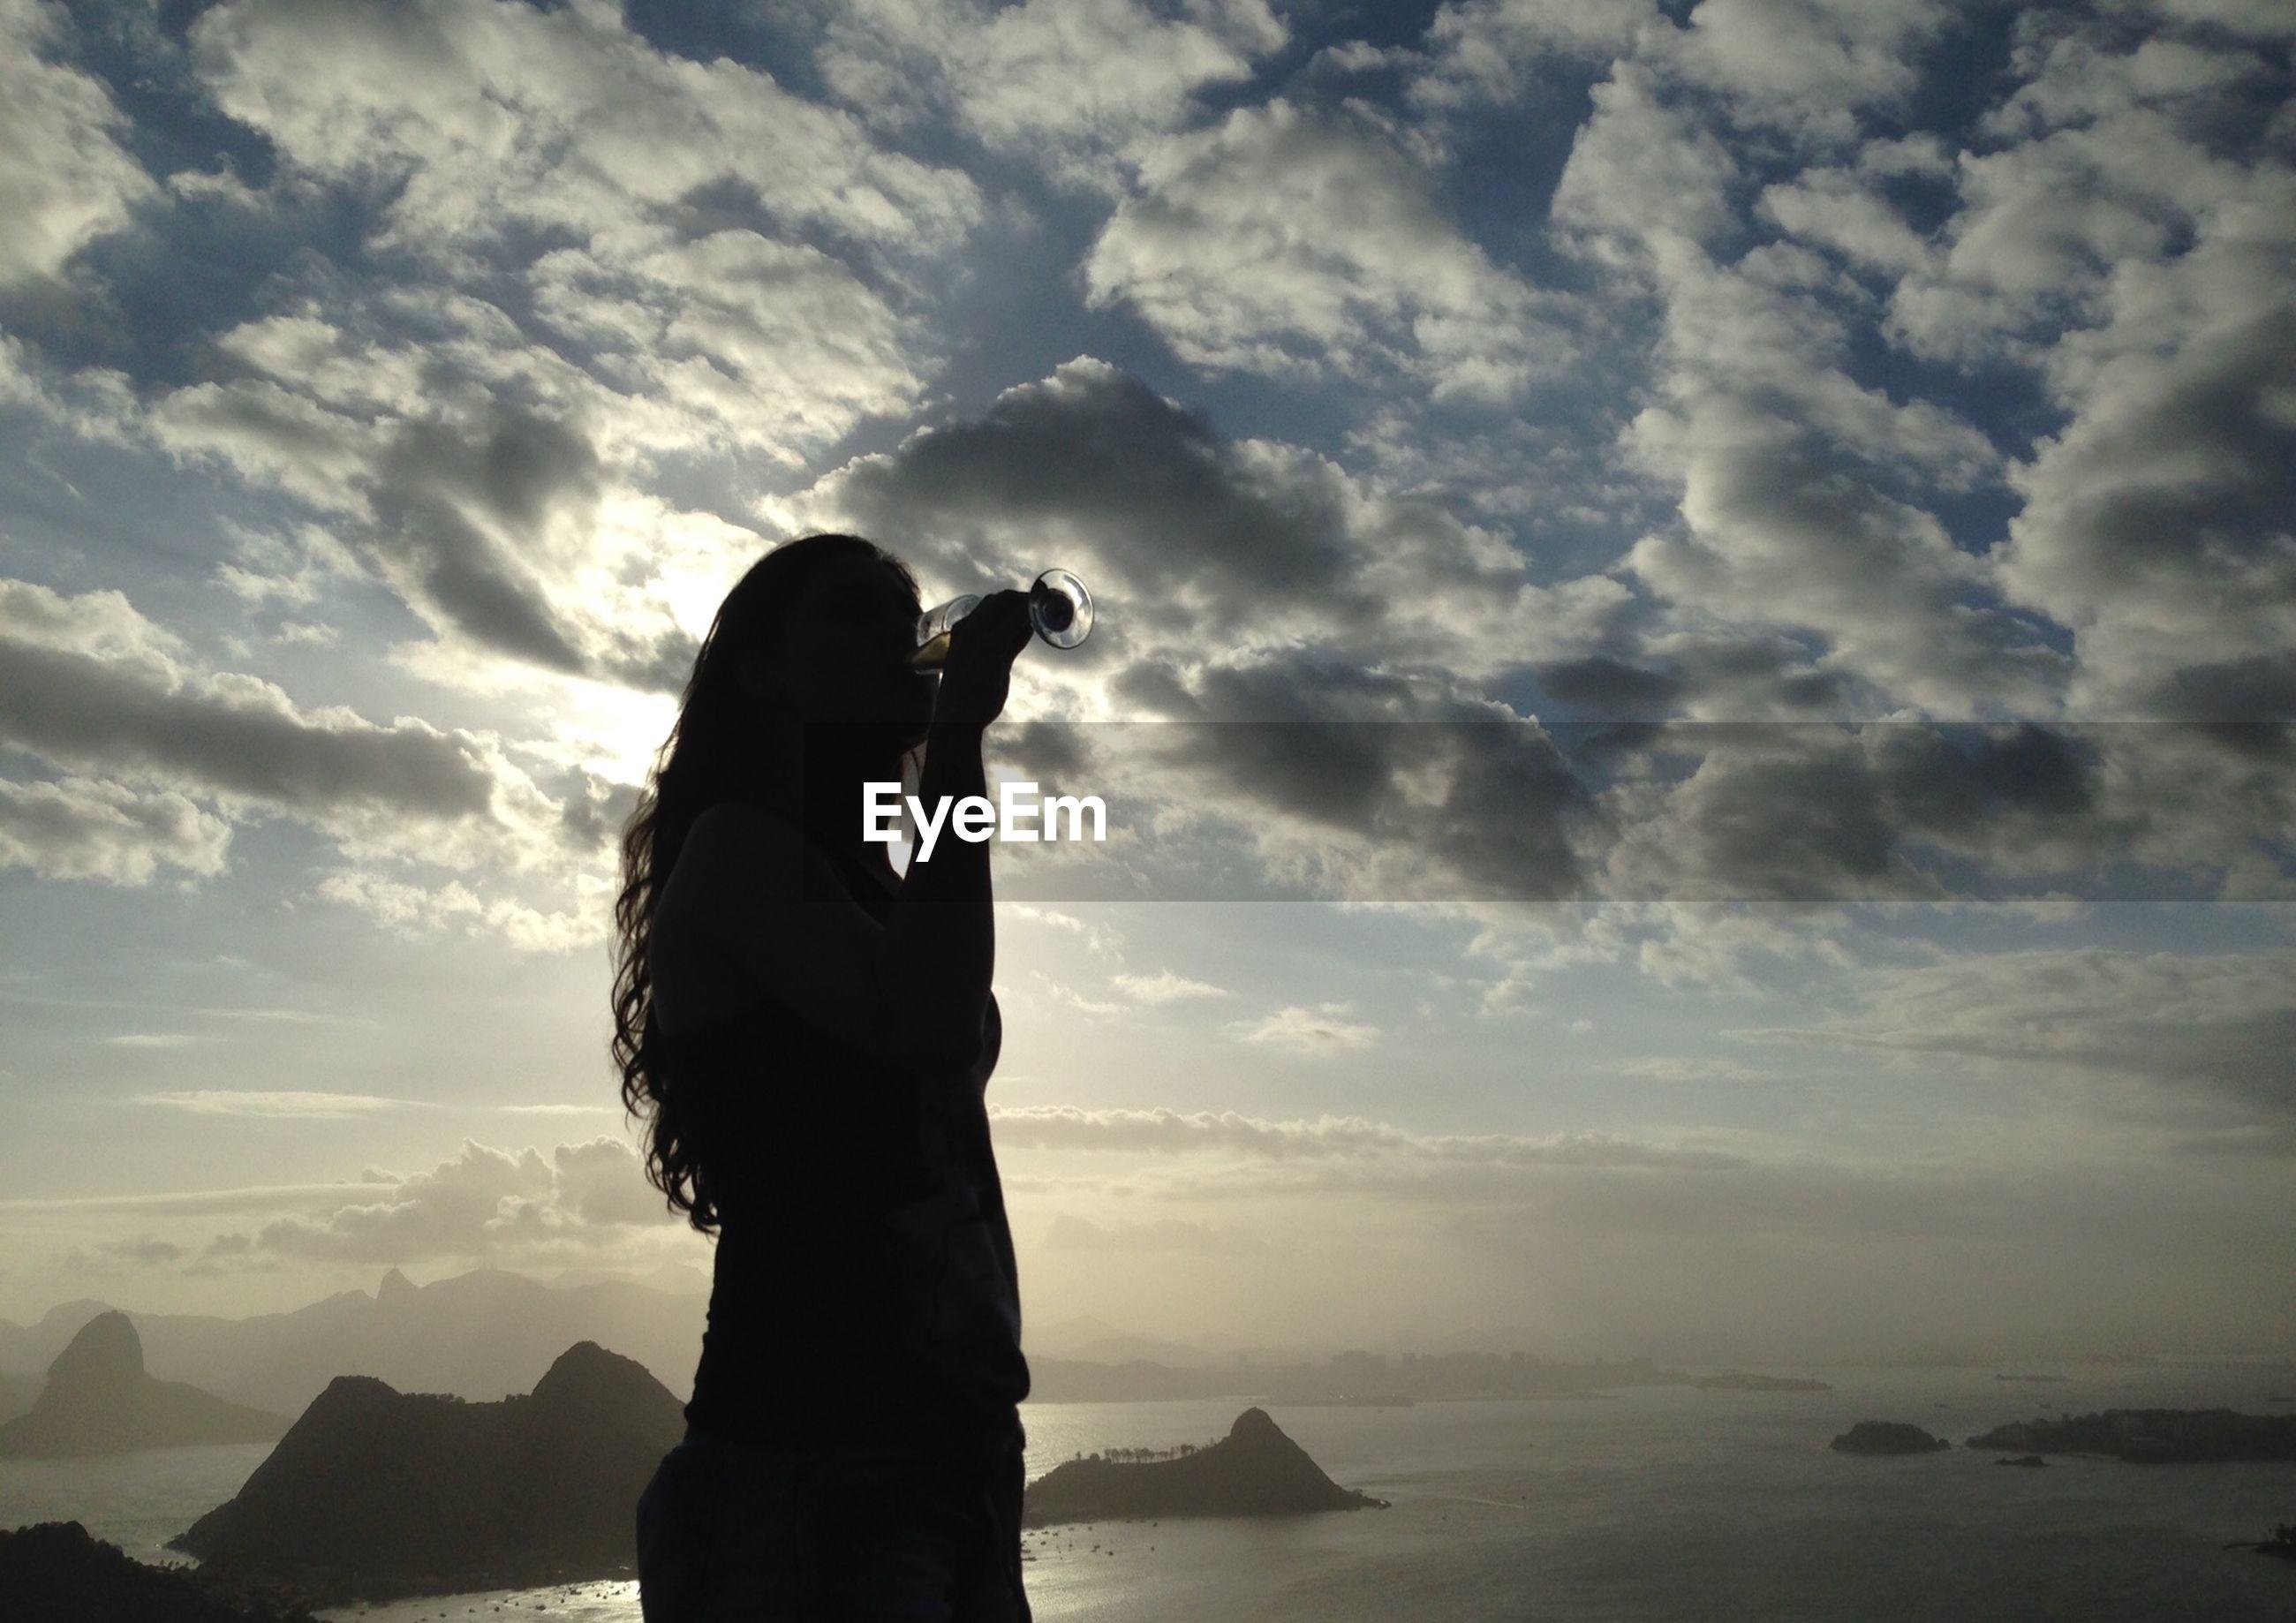 Silhouette woman standing against calm sea